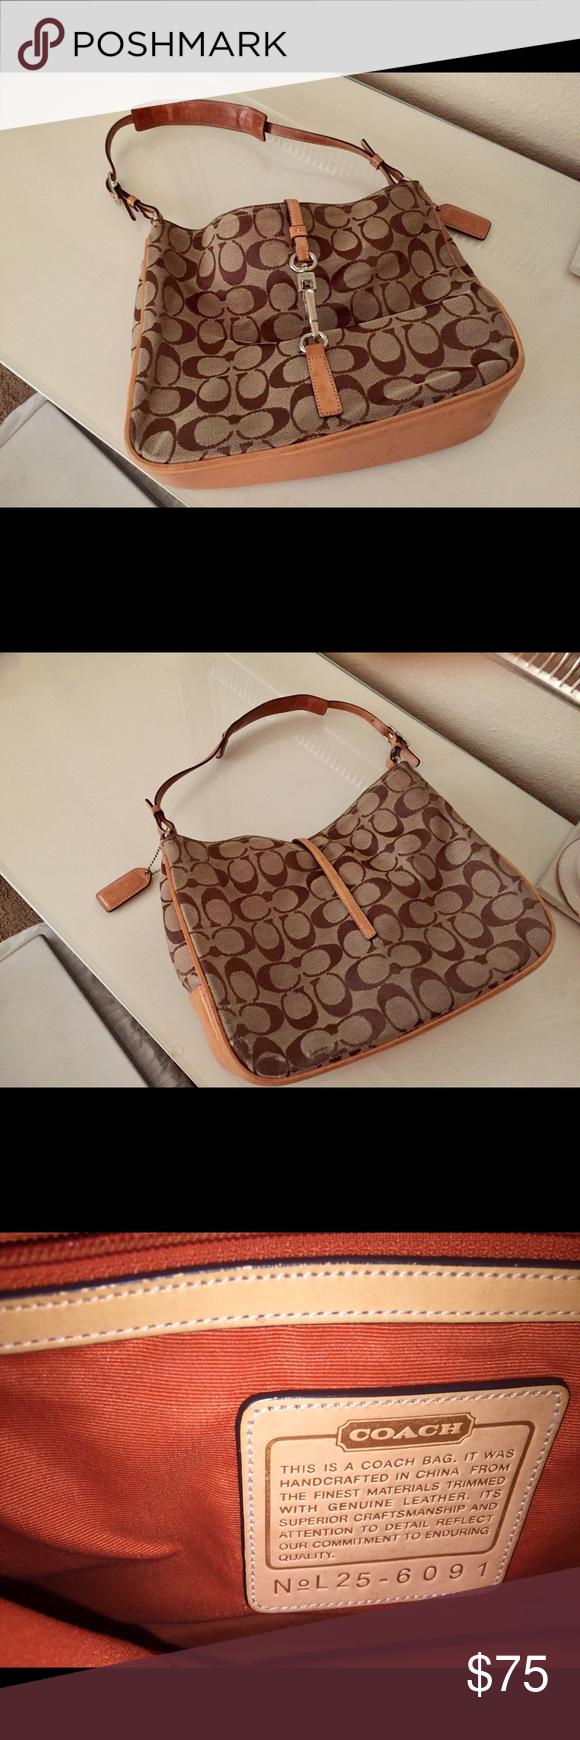 ec79432db01 Coach Signature Fabric handbag   Fabric handbags, Coach bags and ...